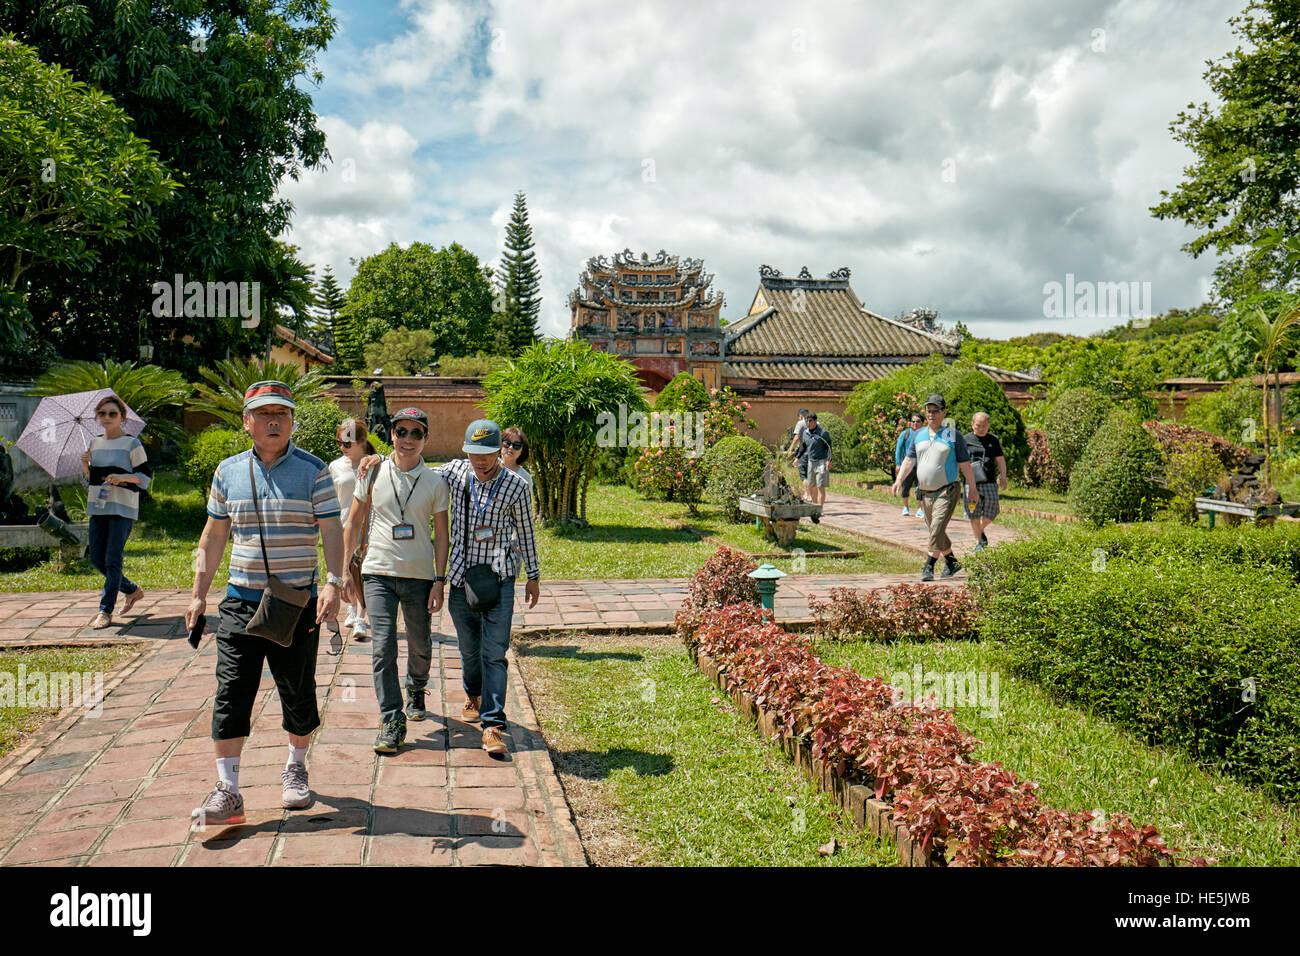 Garden at the Hung To Mieu Temple. Imperial City (The Citadel), Hue, Vietnam. Stock Photo